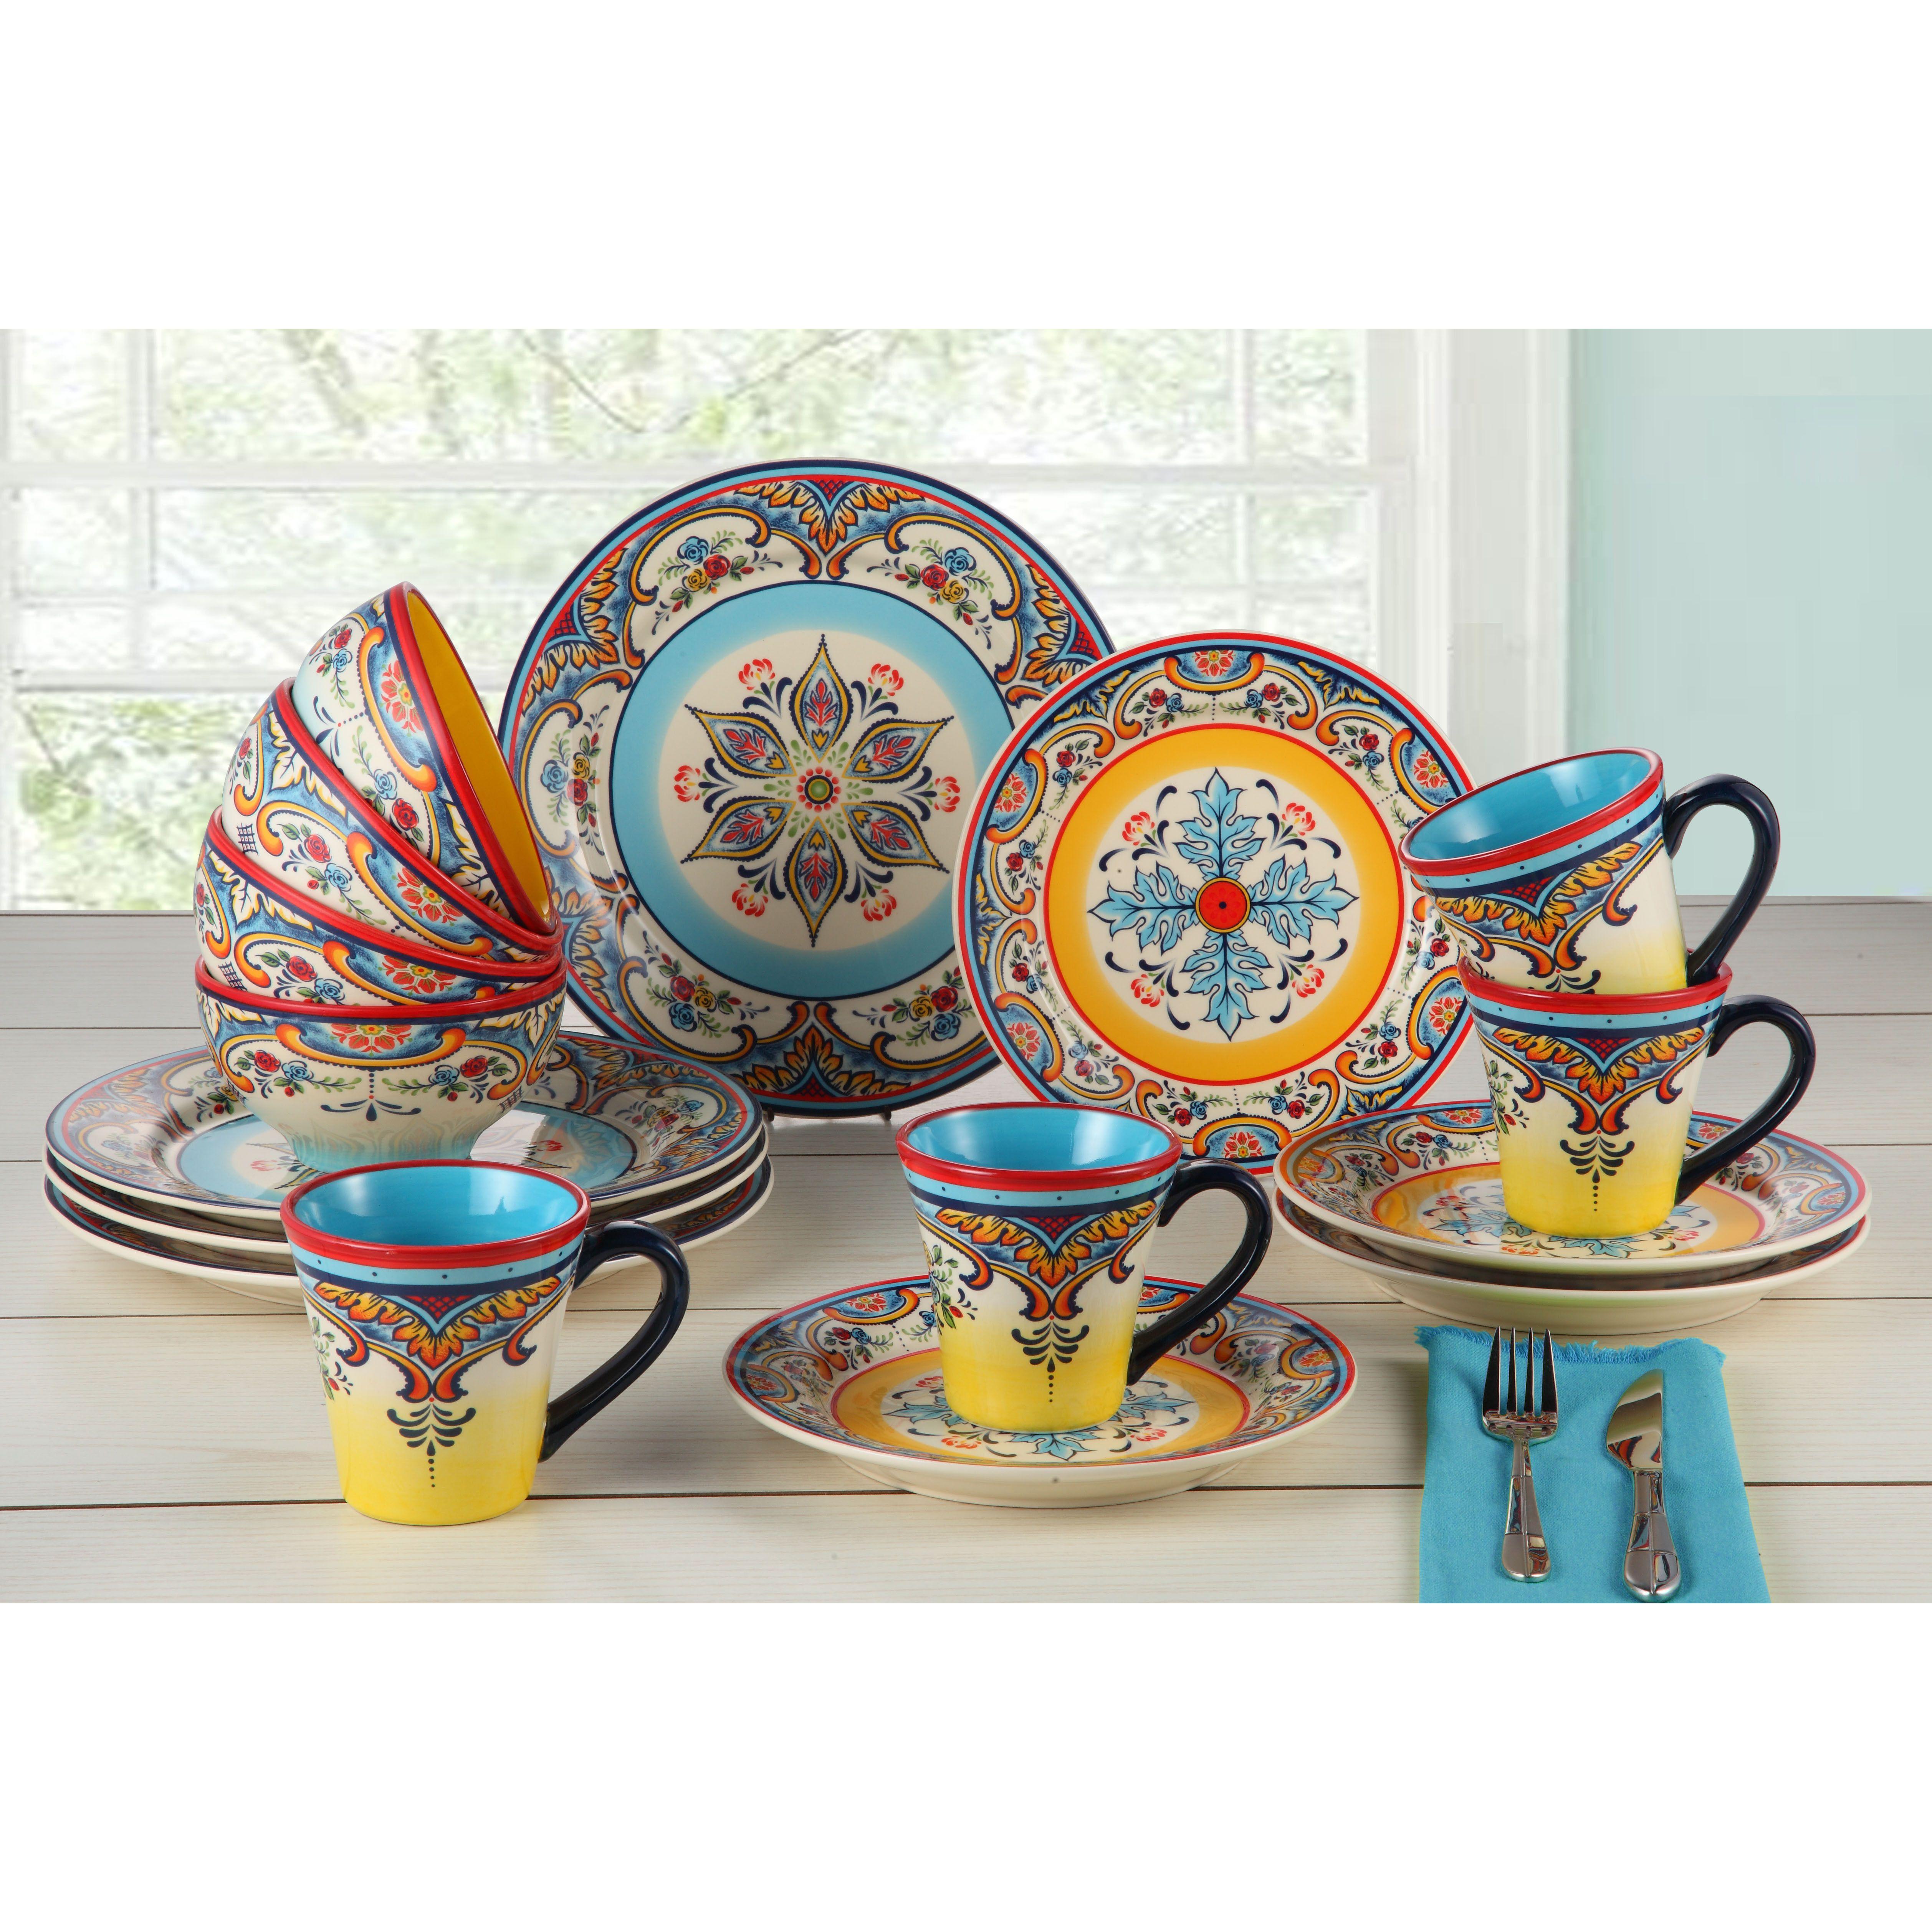 EuroCeramica 16-Piece Zola Dinnerware Set  sc 1 st  Pinterest & Zanzibar 16 Piece Dinnerware Set Service for 4 | Dinnerware and ...